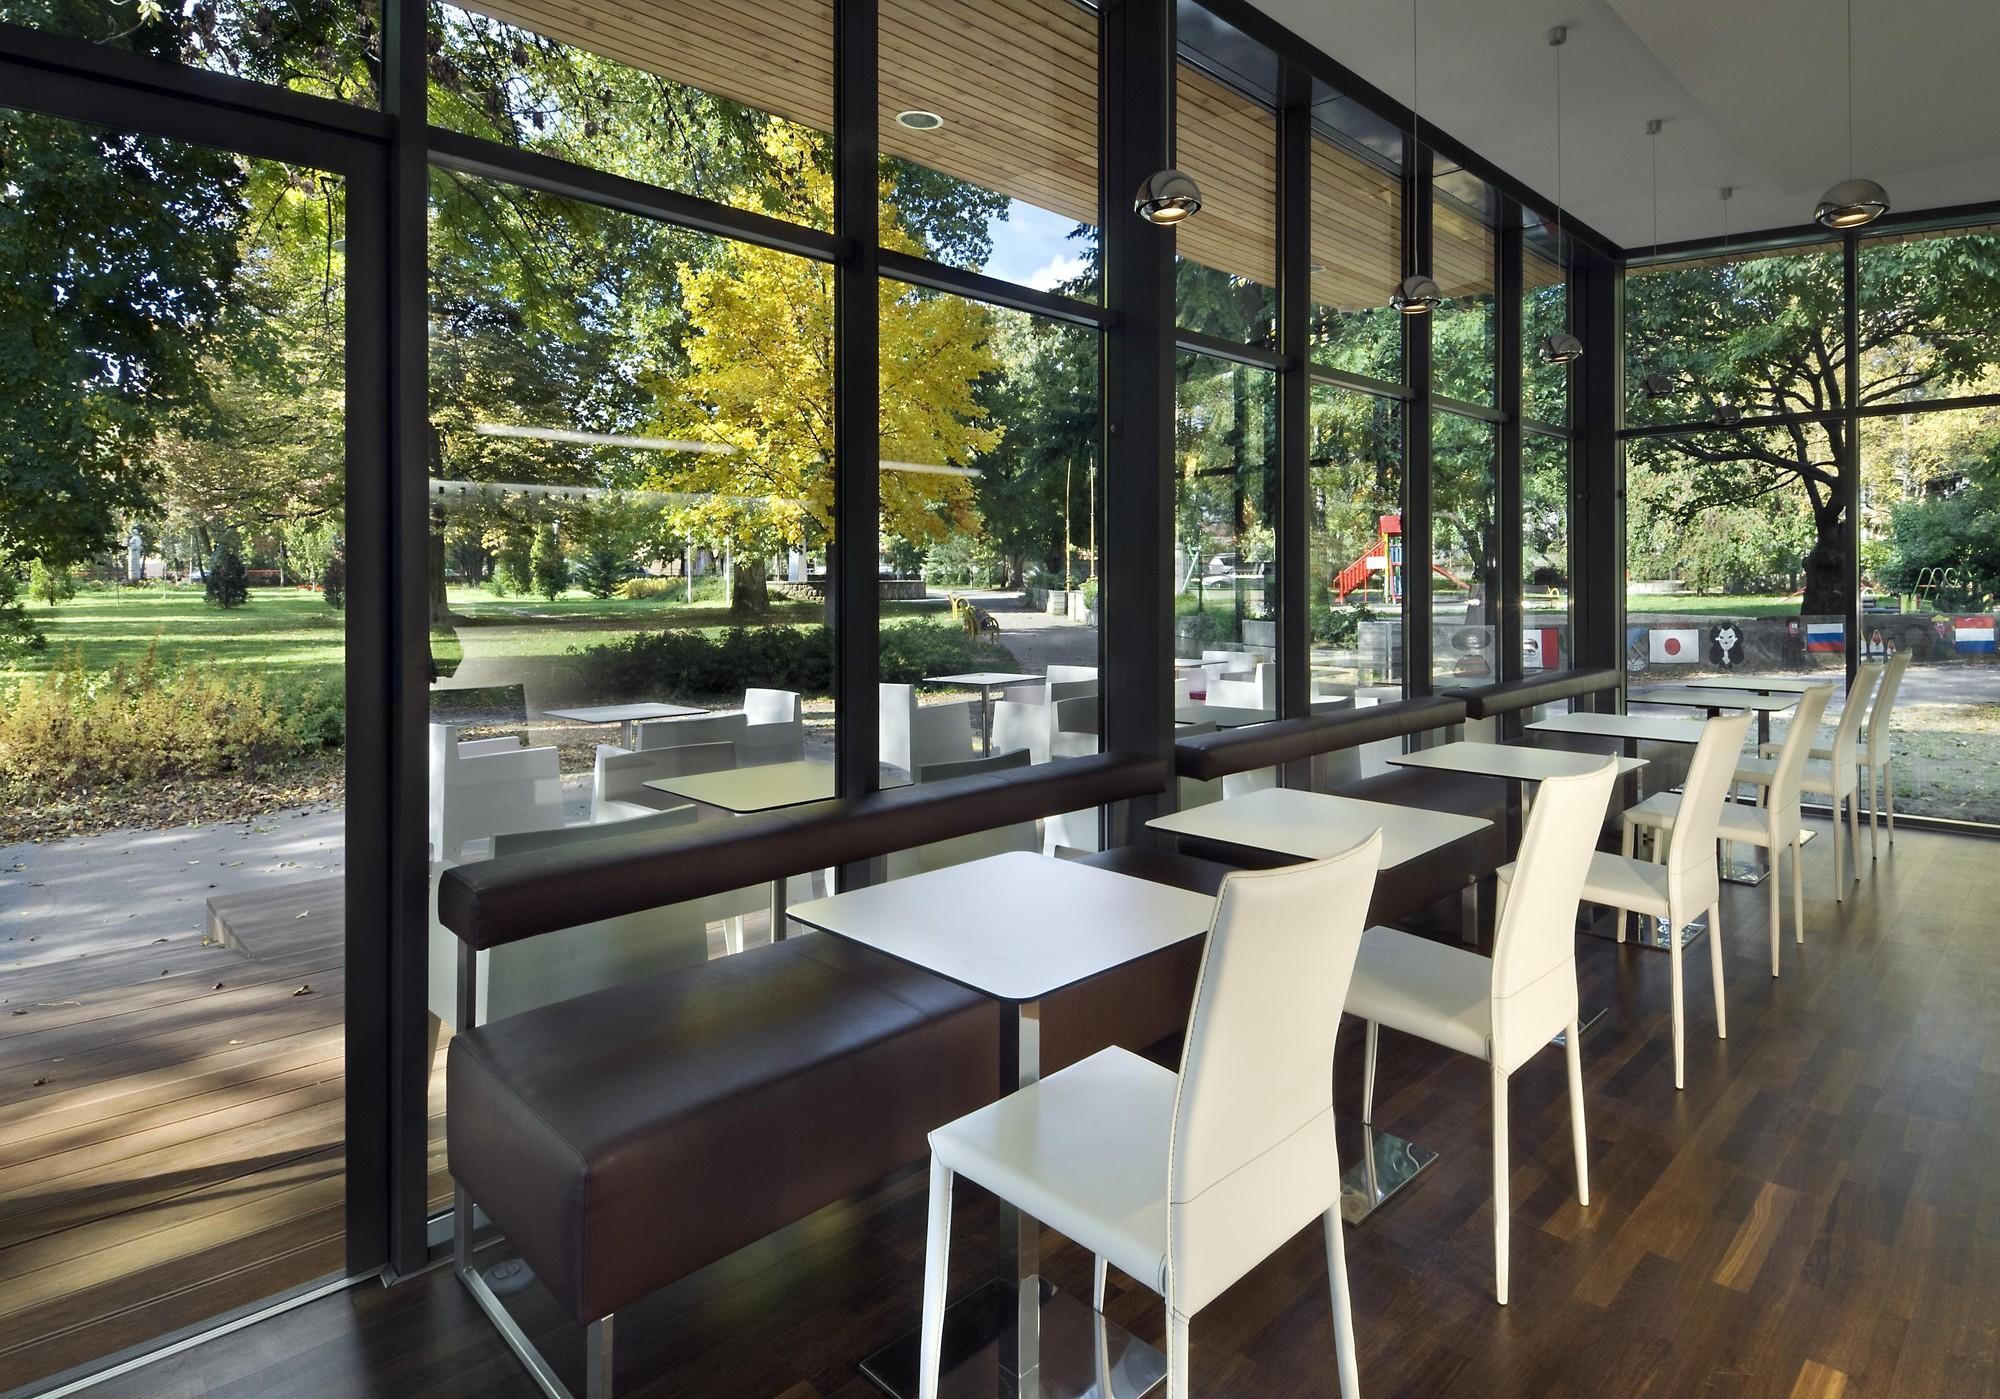 Garden Diner And Cafe